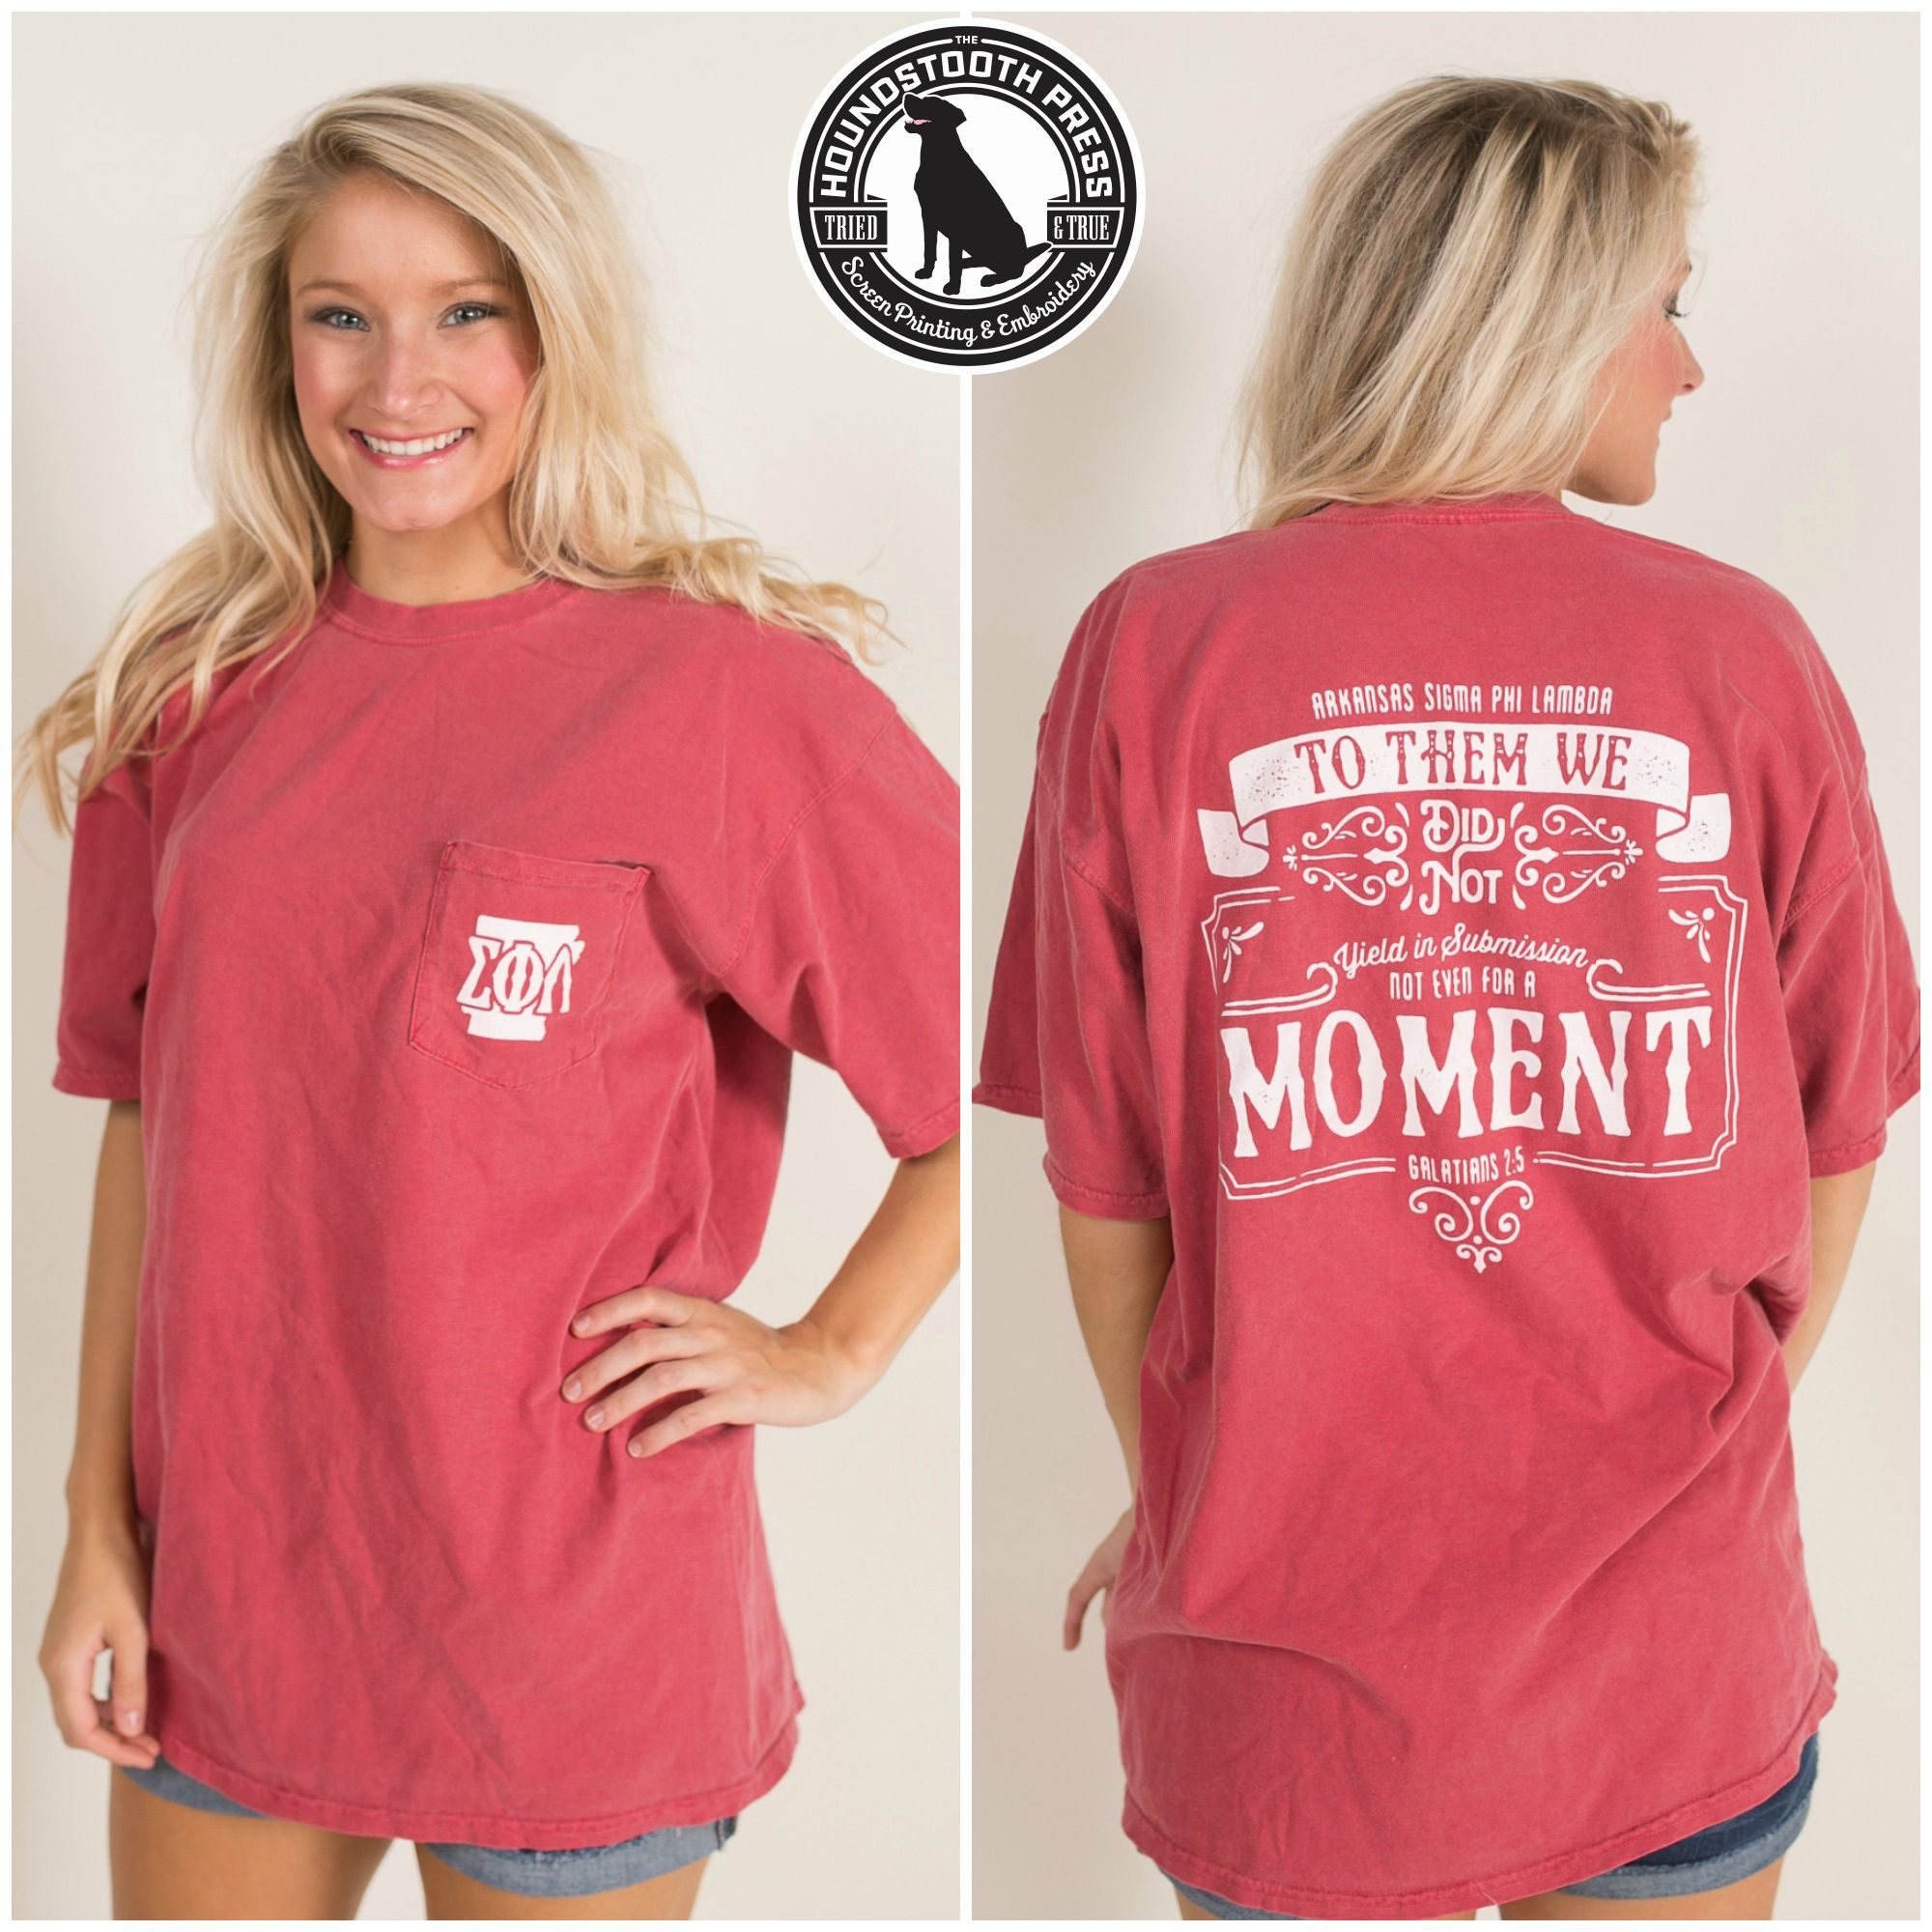 Design t shirt comfort colors - University Of Arkansas Sigma Phi Lambda Promotional T Shirt Comfort Colors Crimson